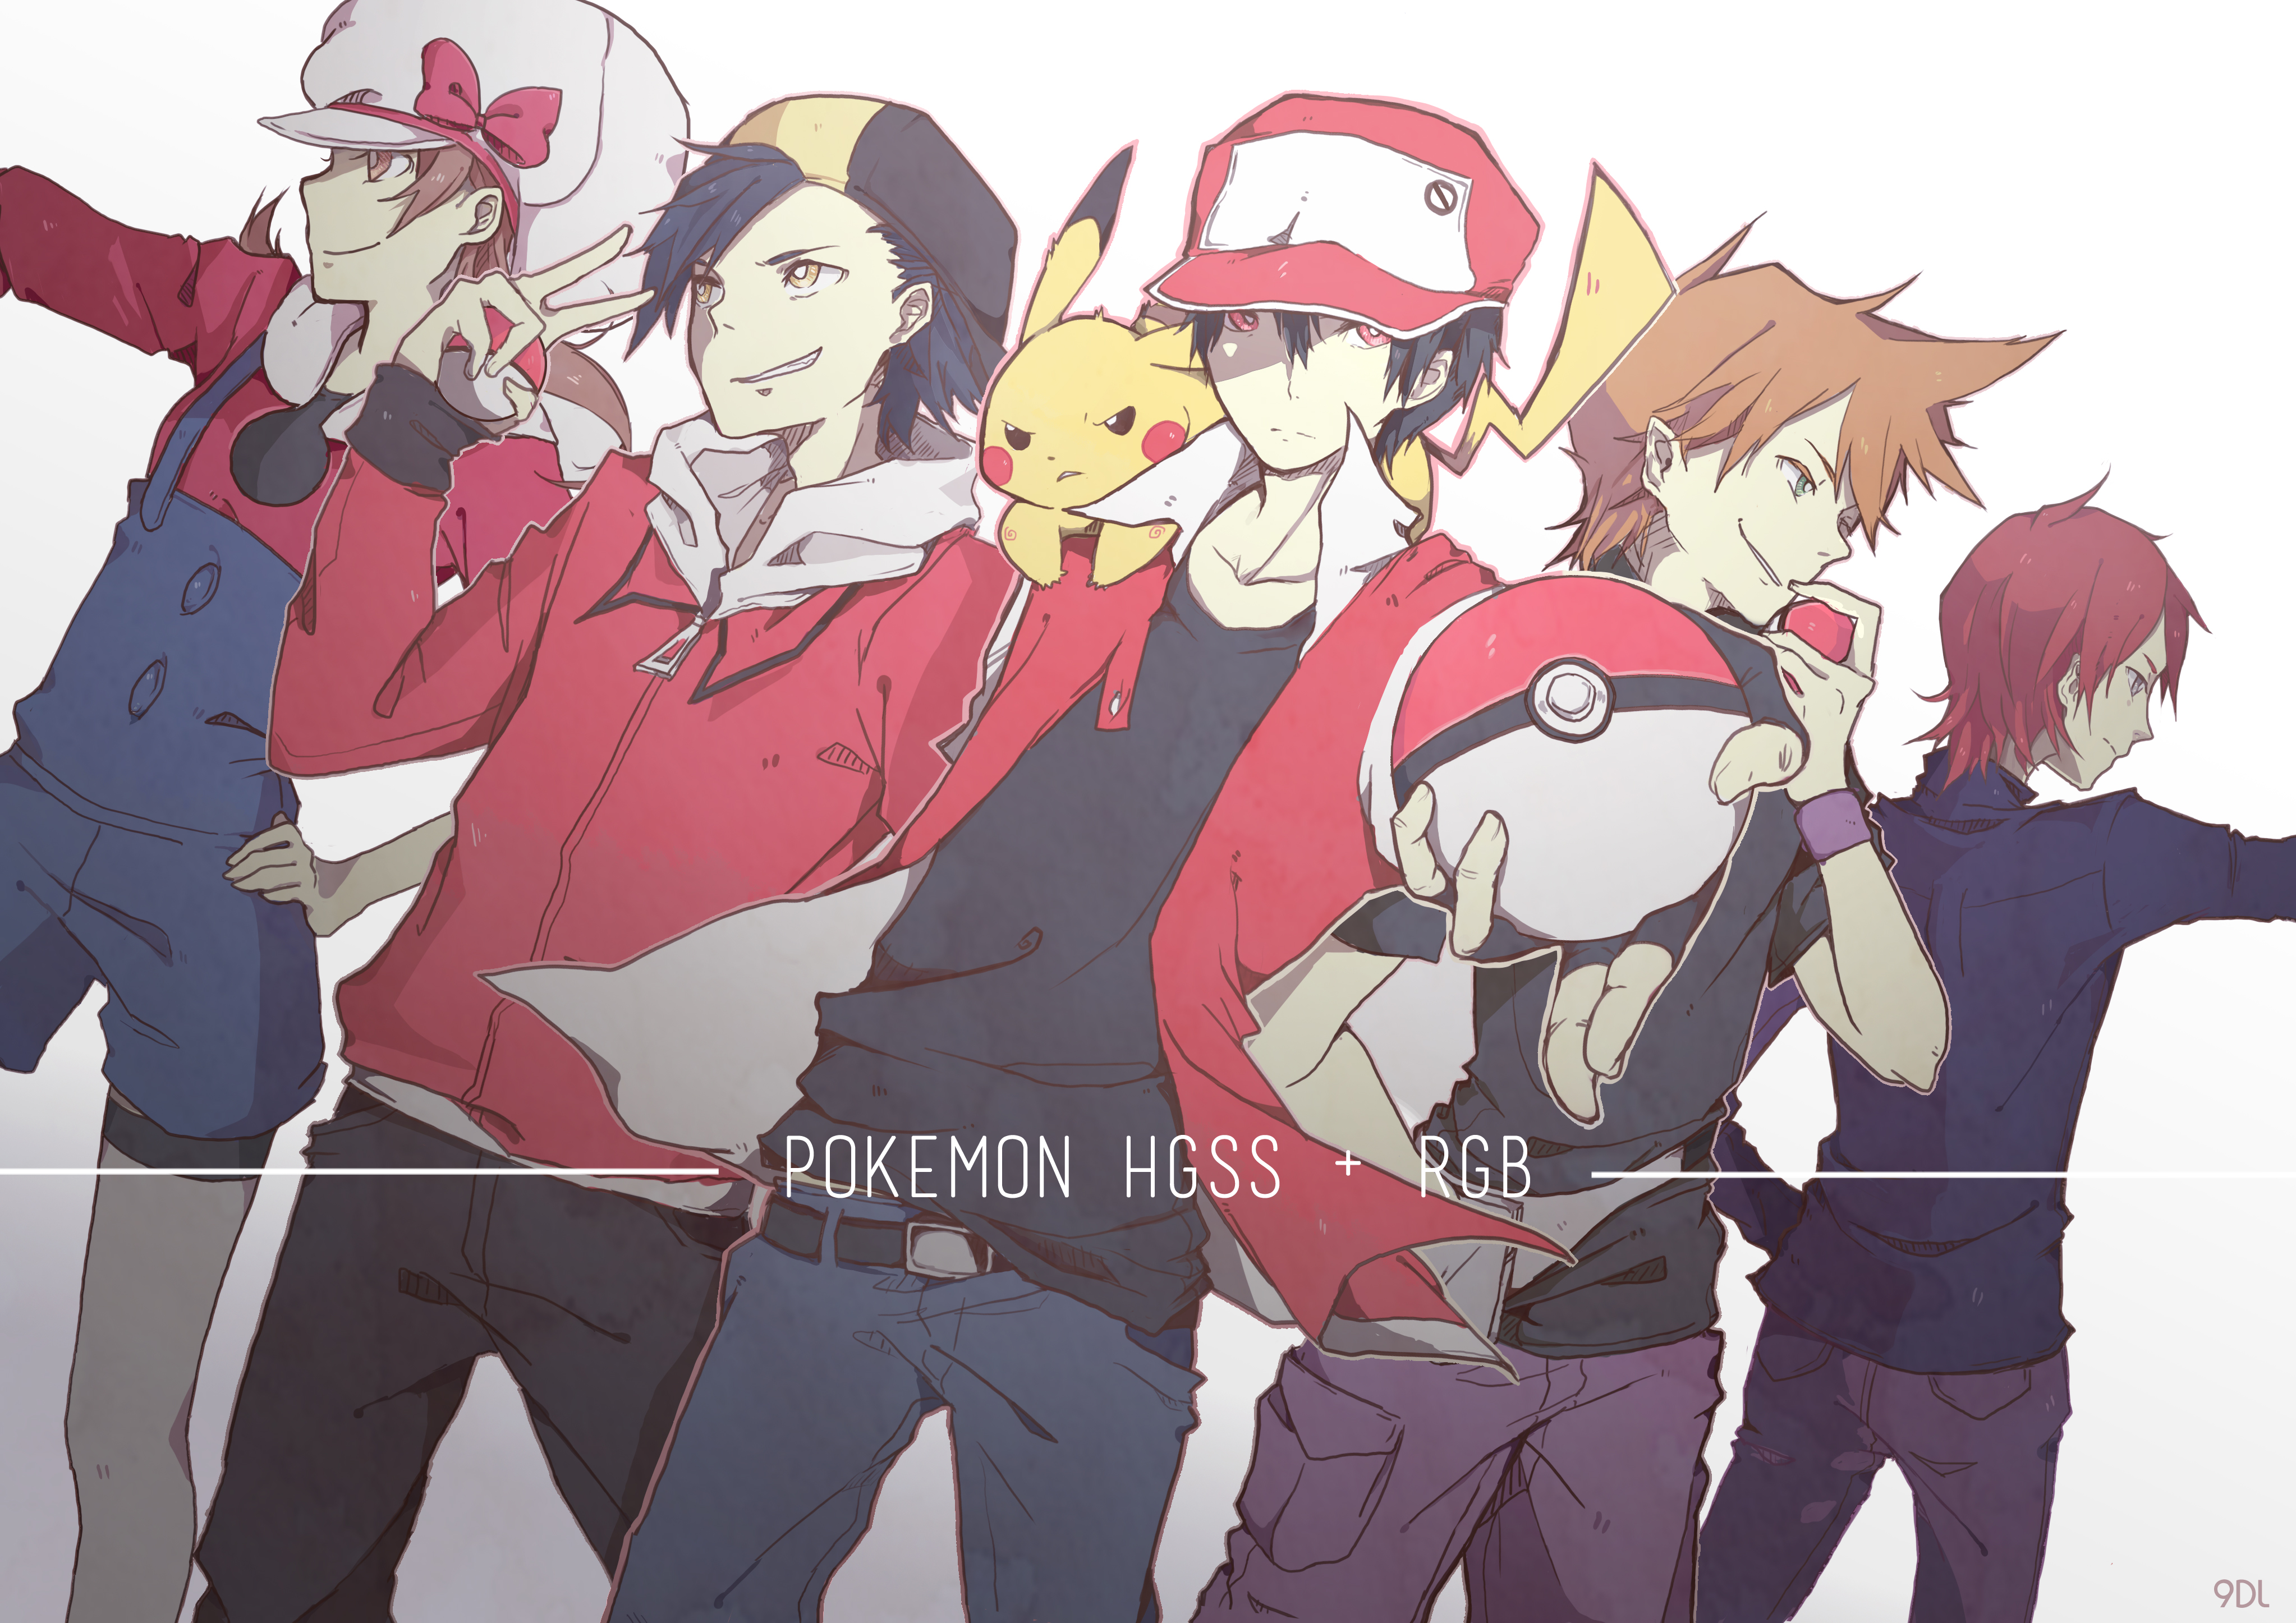 Characters Images Silver Pigstruction: Pokémon Image #1980948